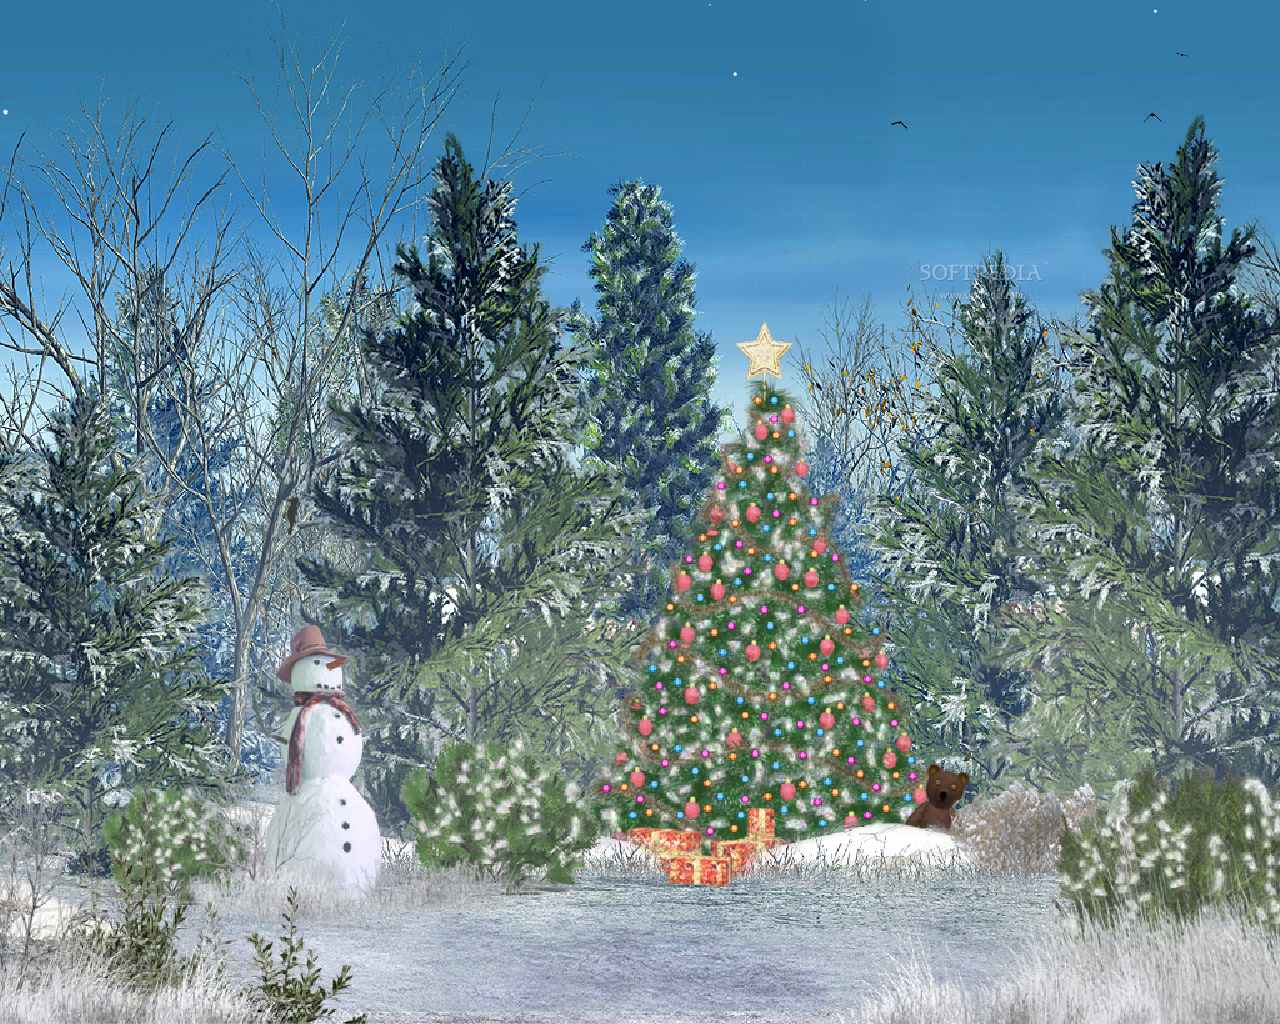 Free Animated Christmas Wallpapers And Screensavers hd photo